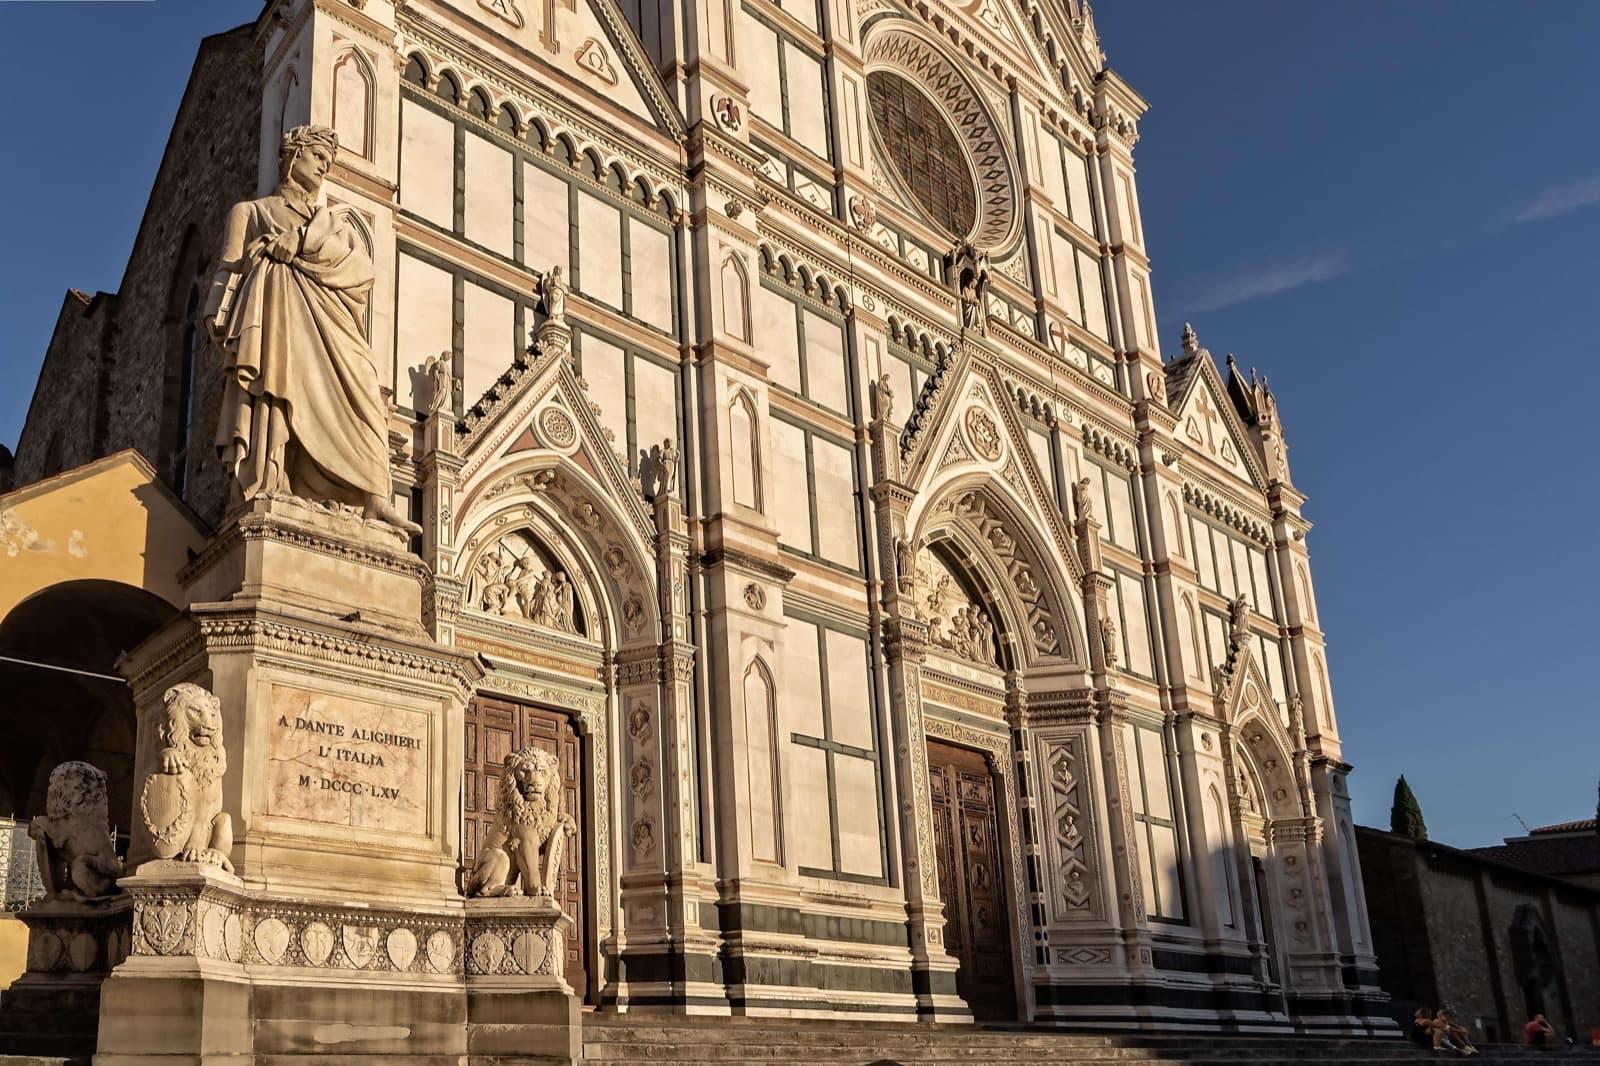 Firenze, Santa Croce - Roads of Dante